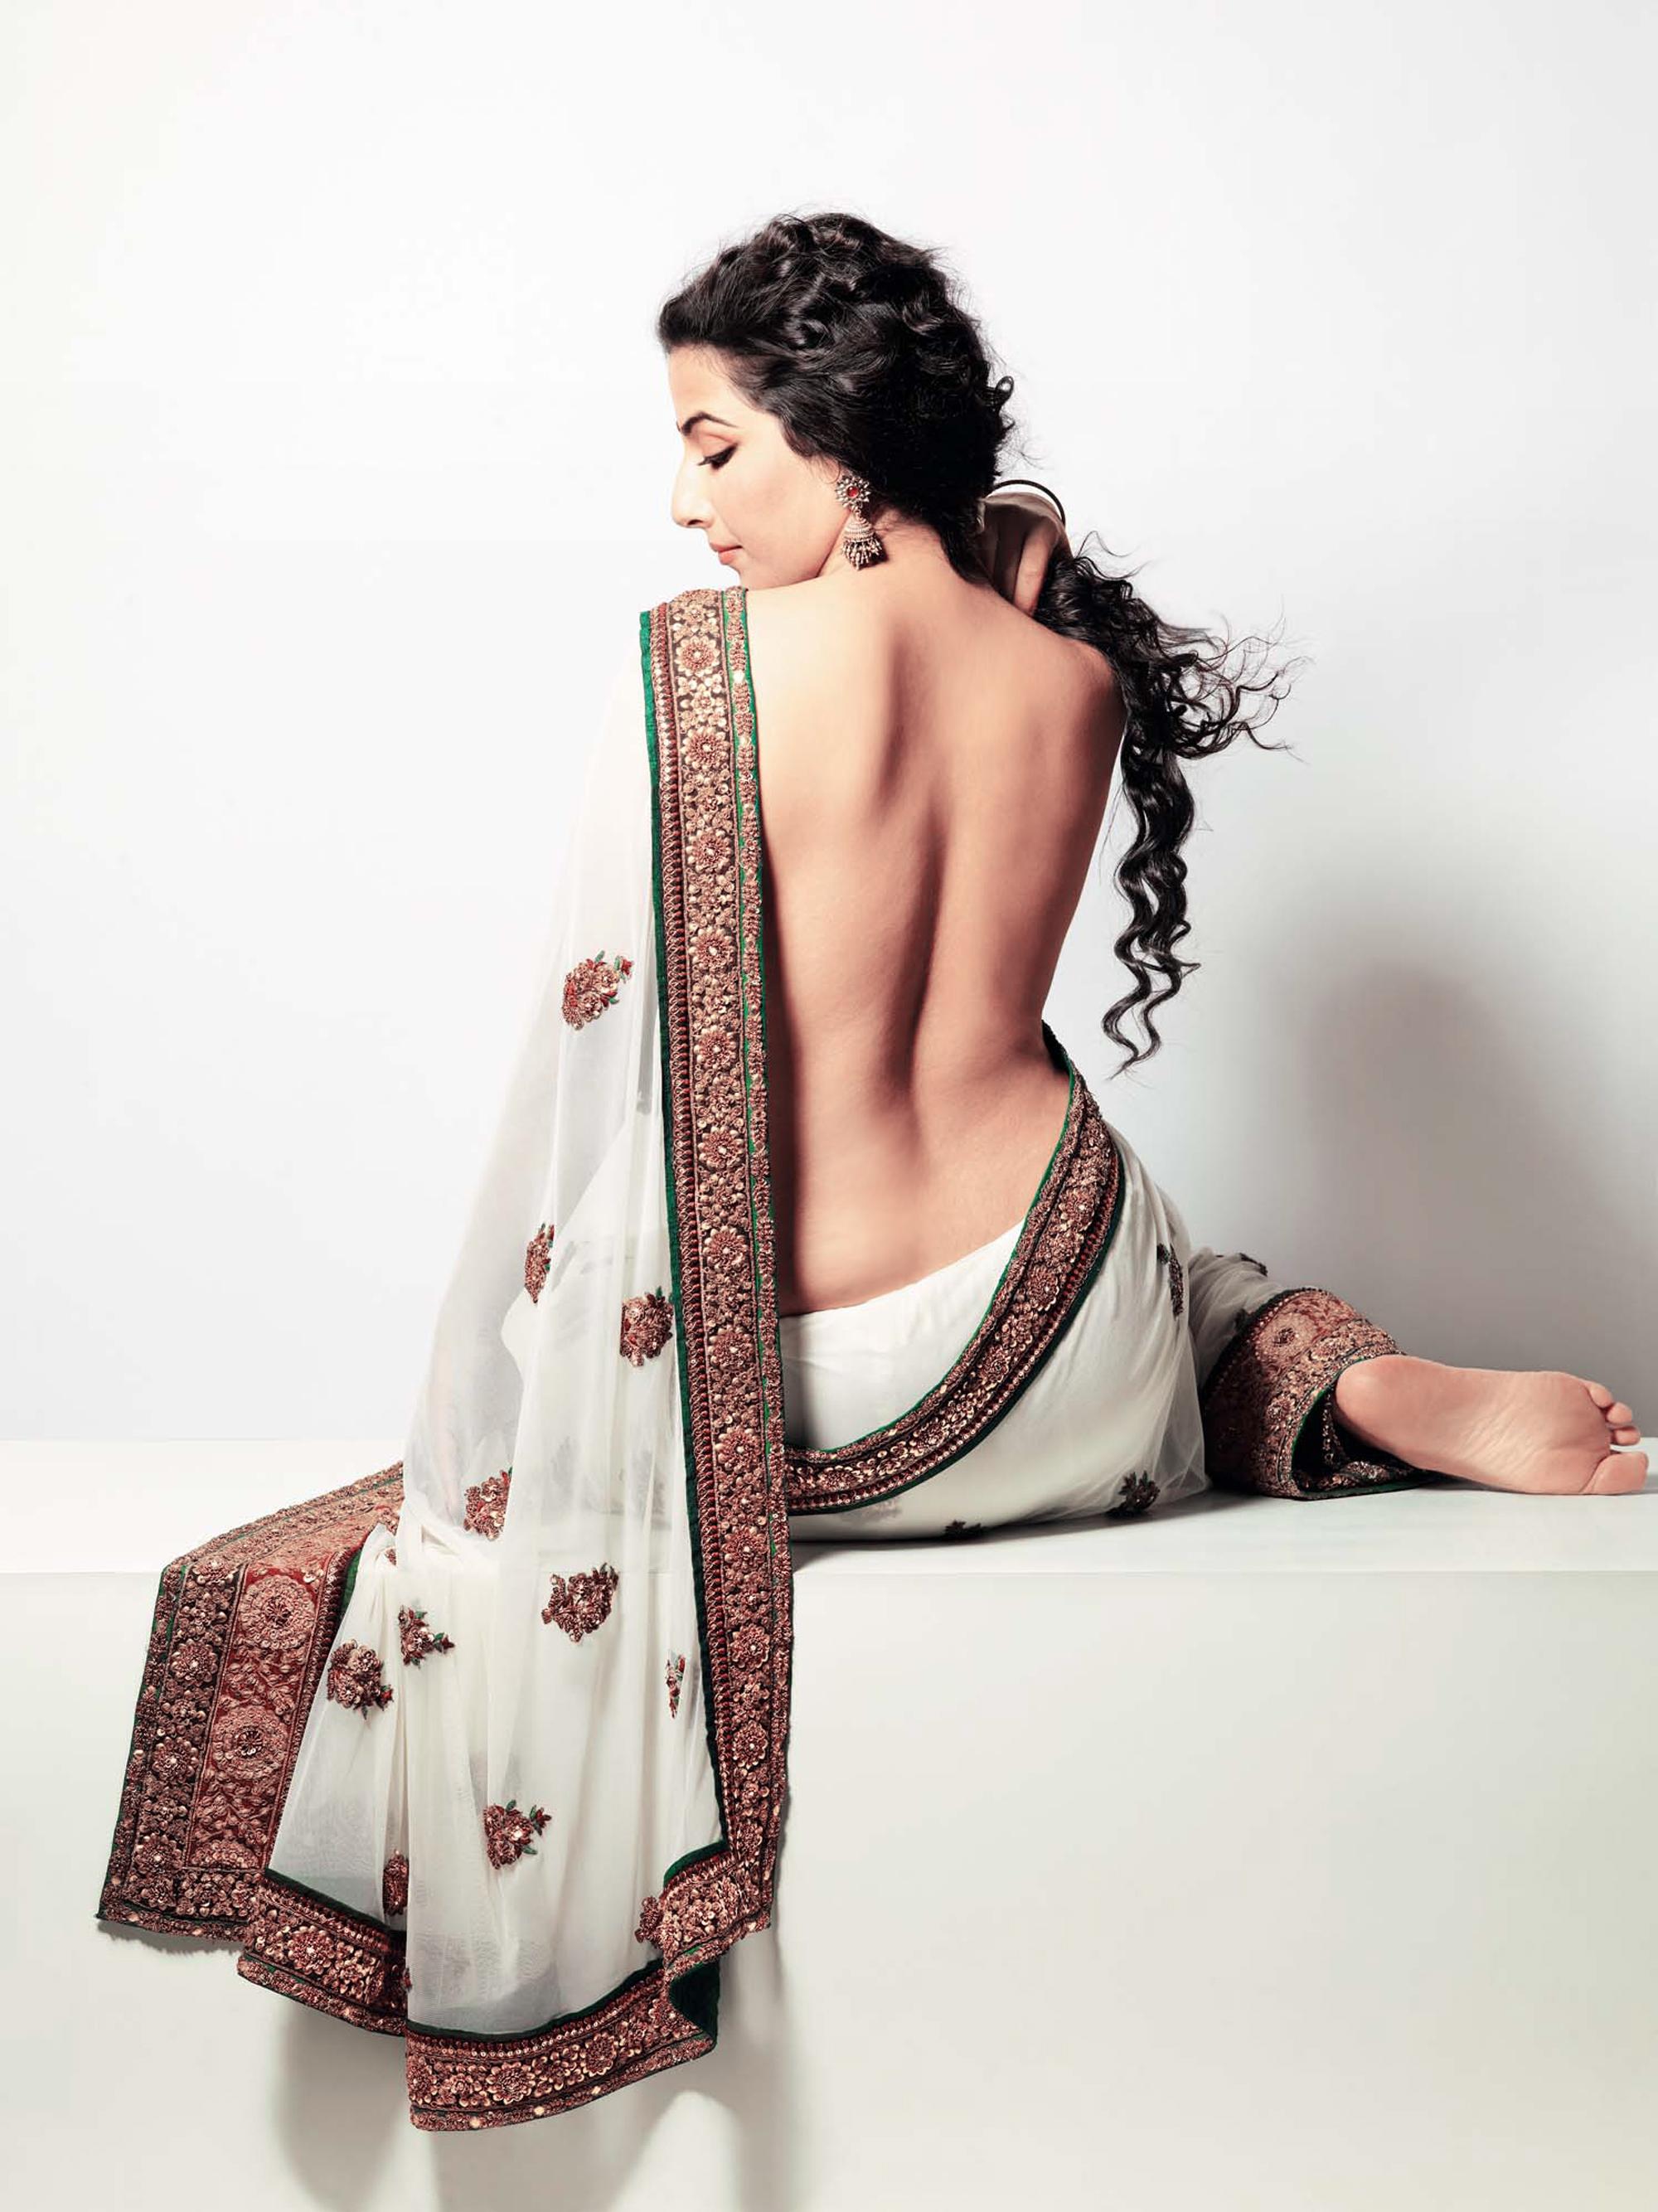 Vidya Balan In Fhm Magazine November 2010  Photo Press-5249